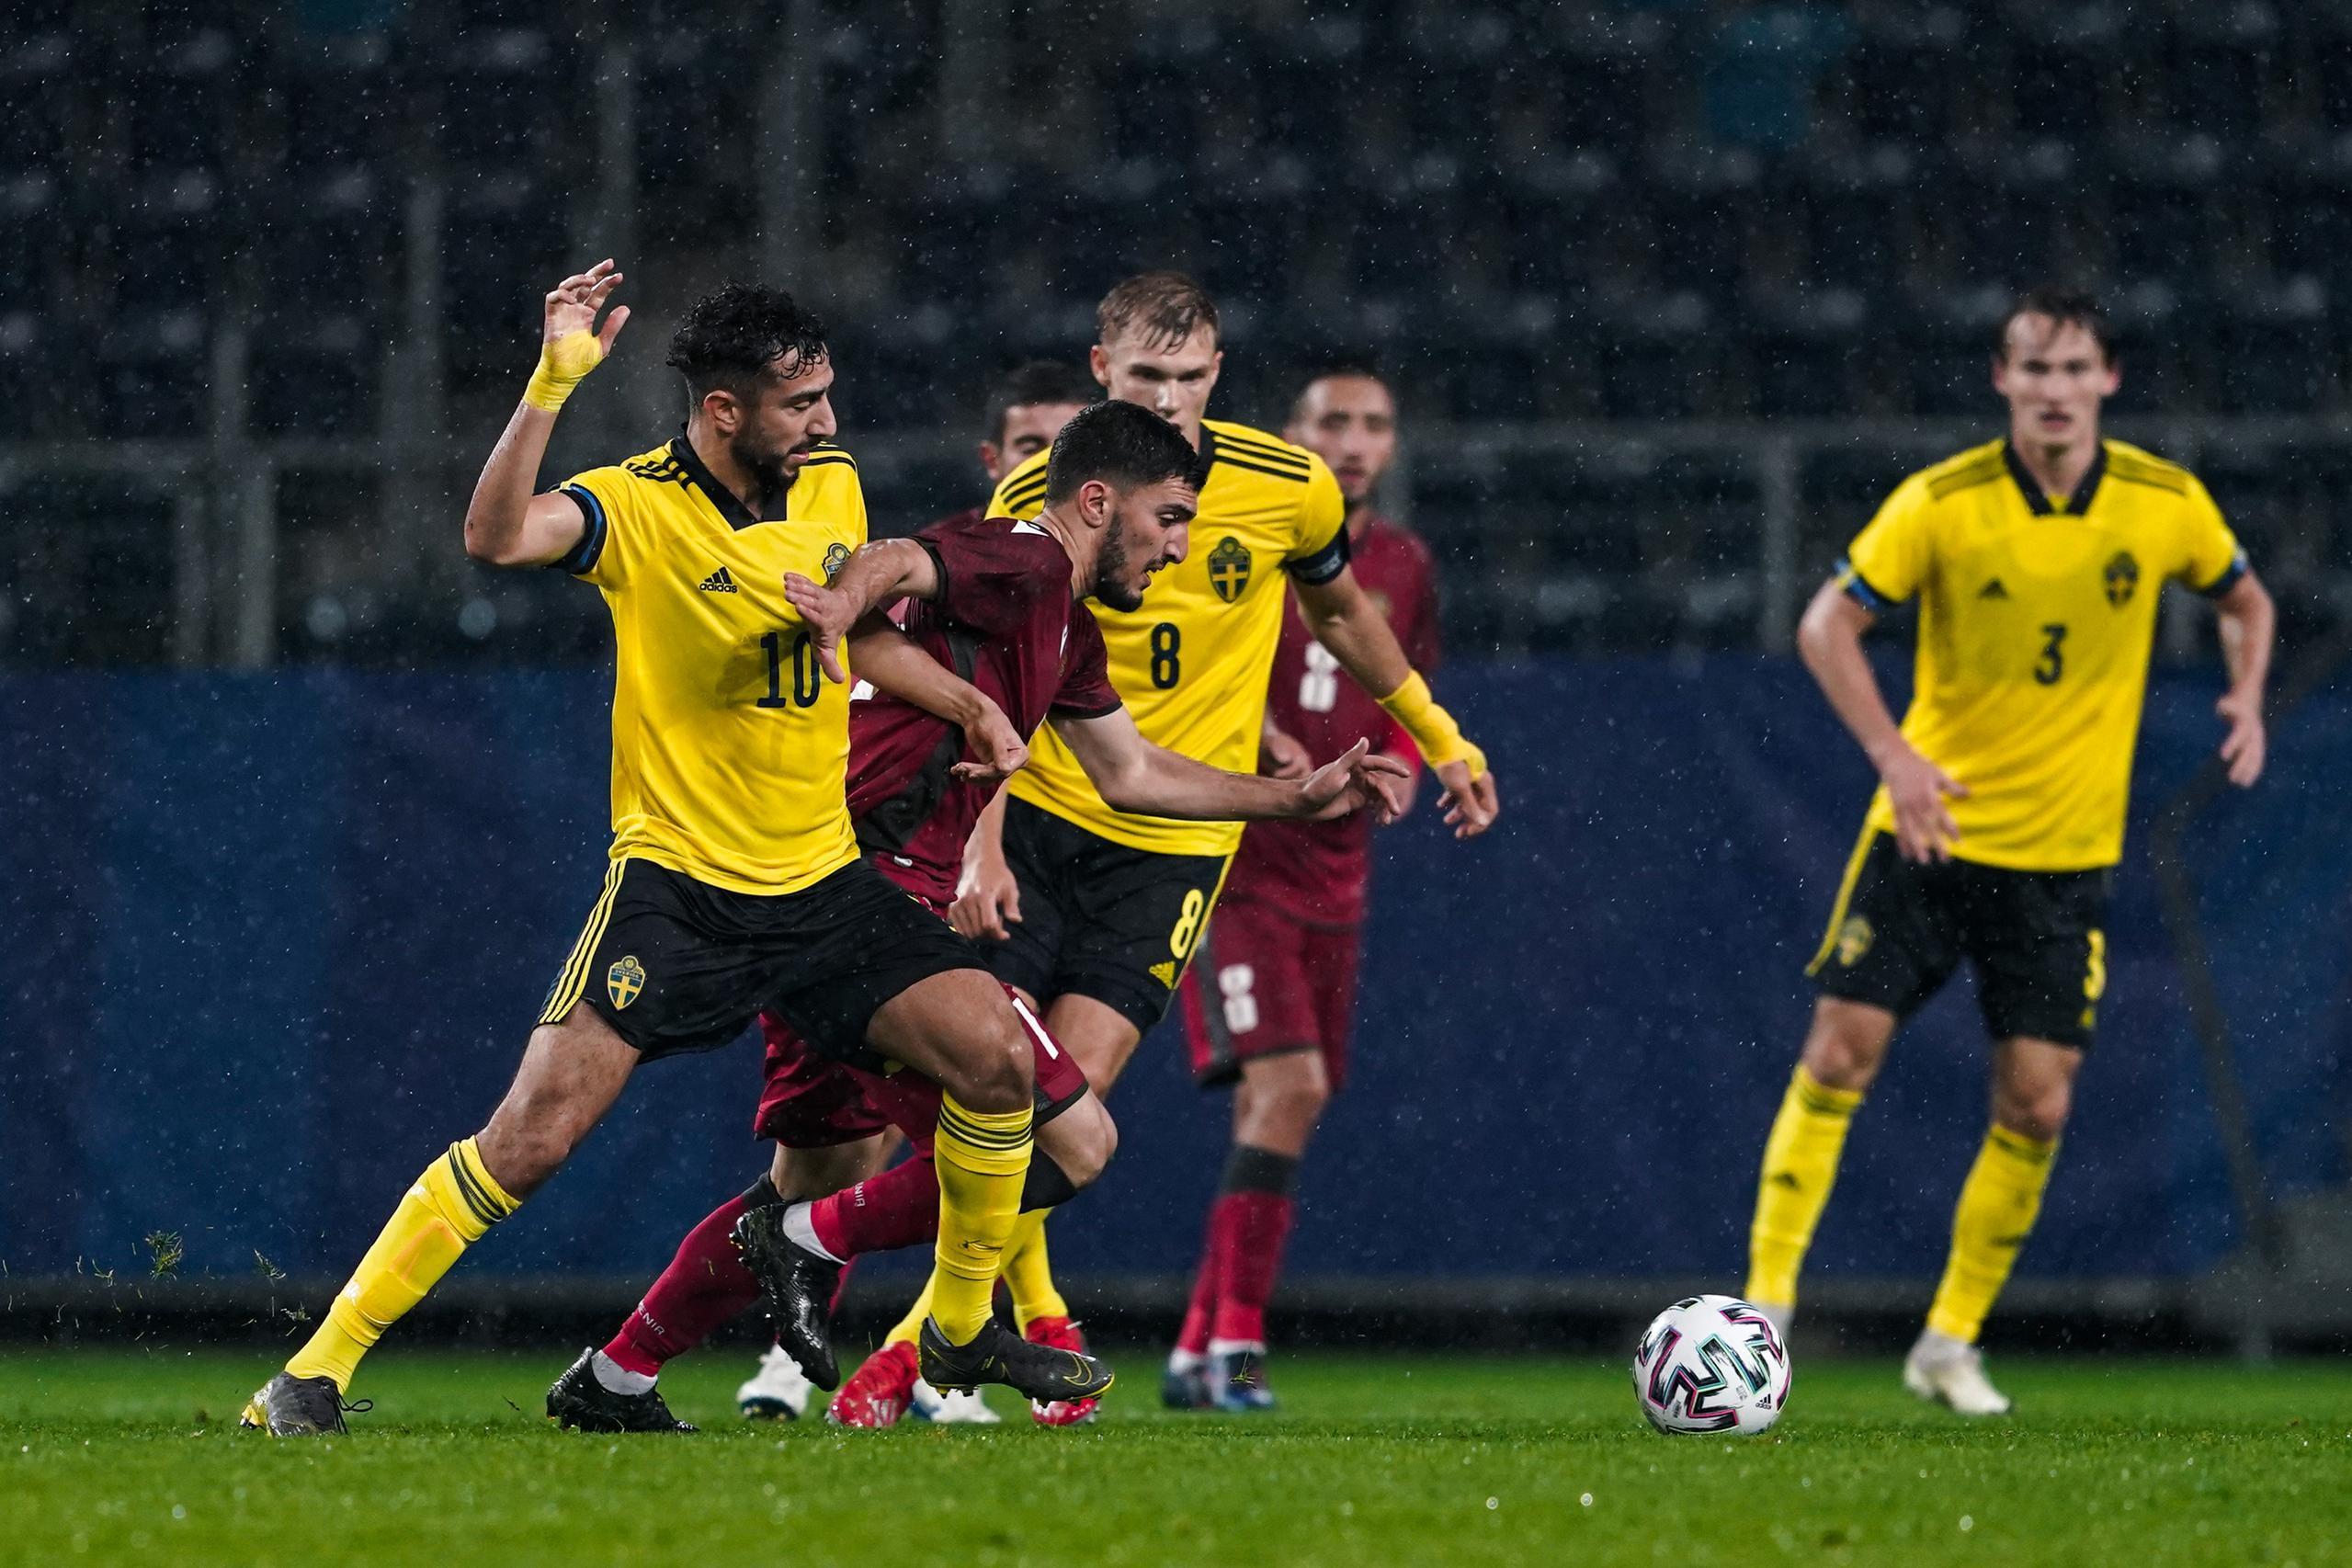 Sveriges U21-match mot Armenien ställs in